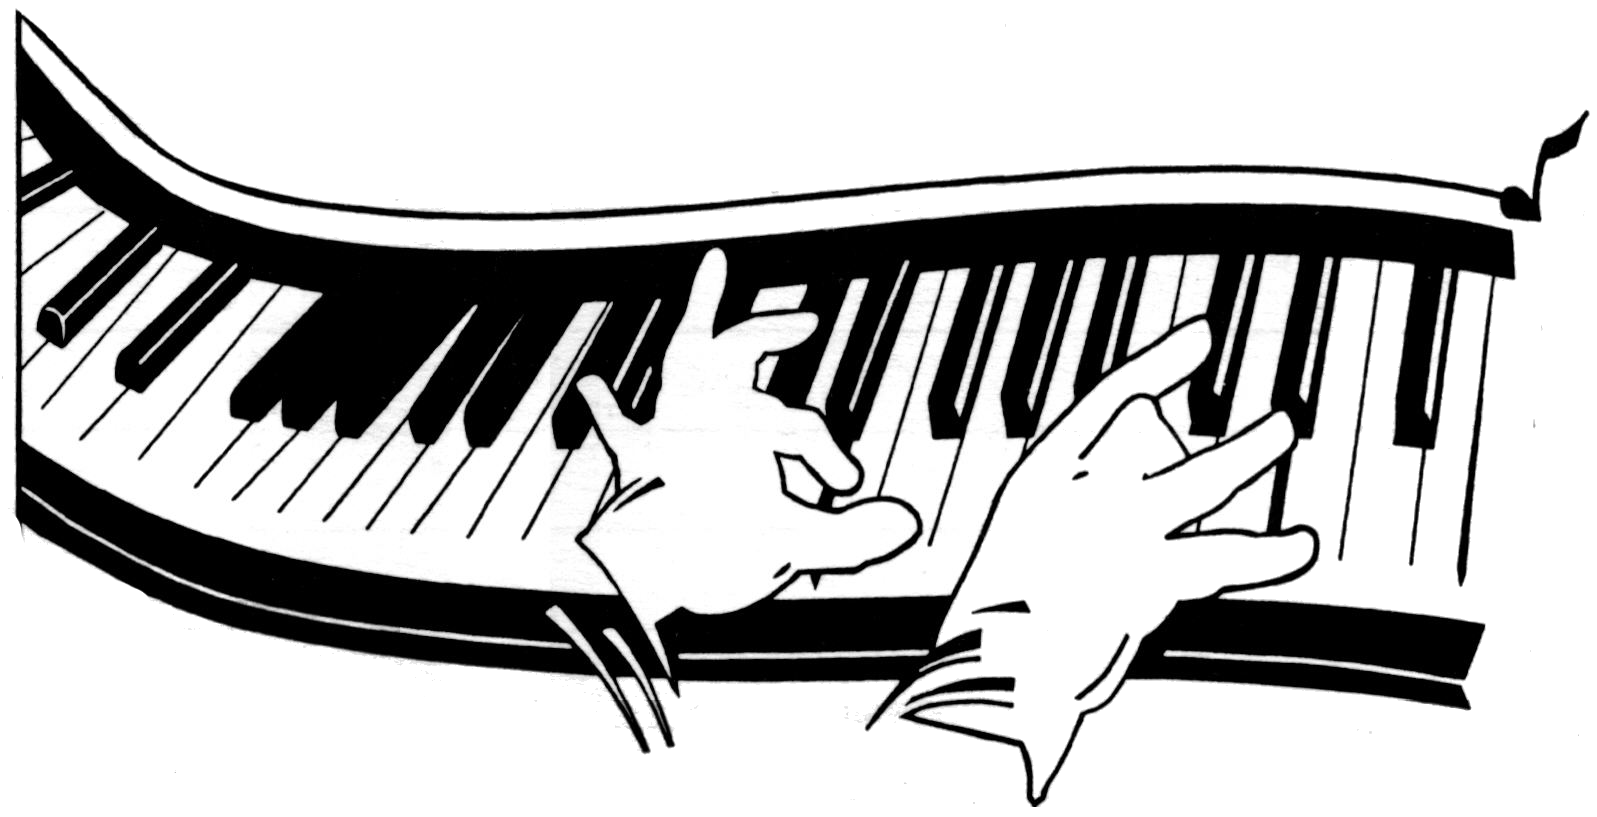 More Music Clip Art